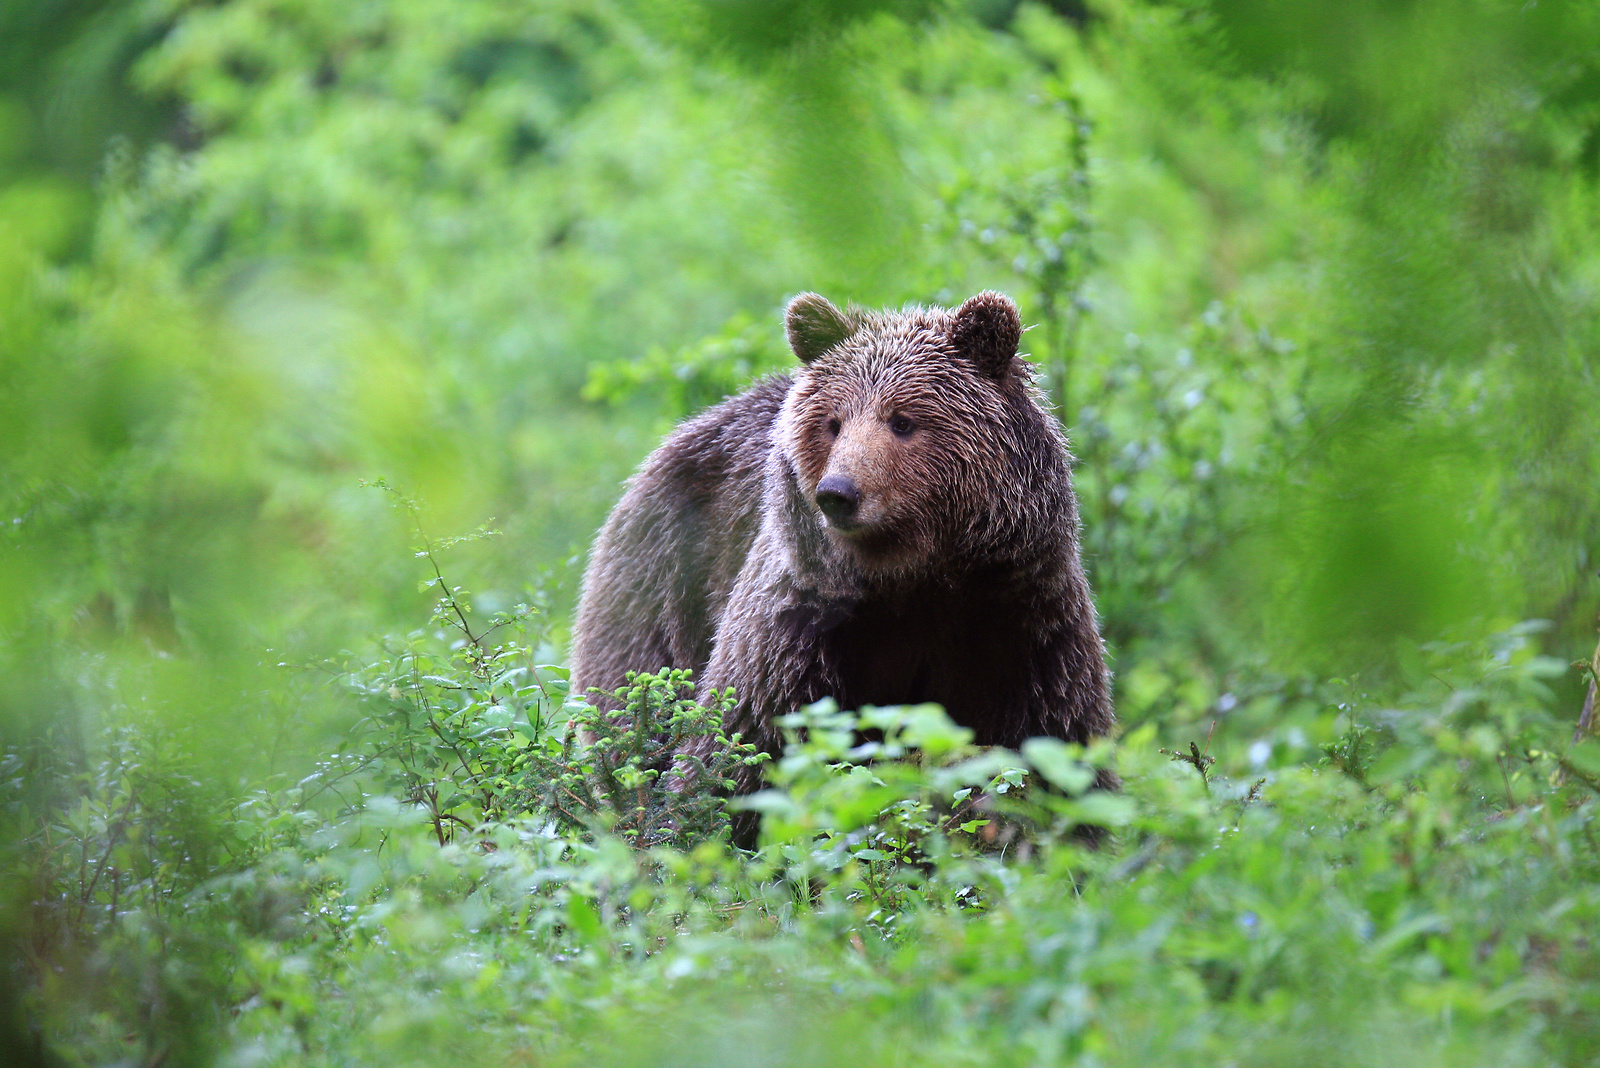 Bear-watching Slovenia